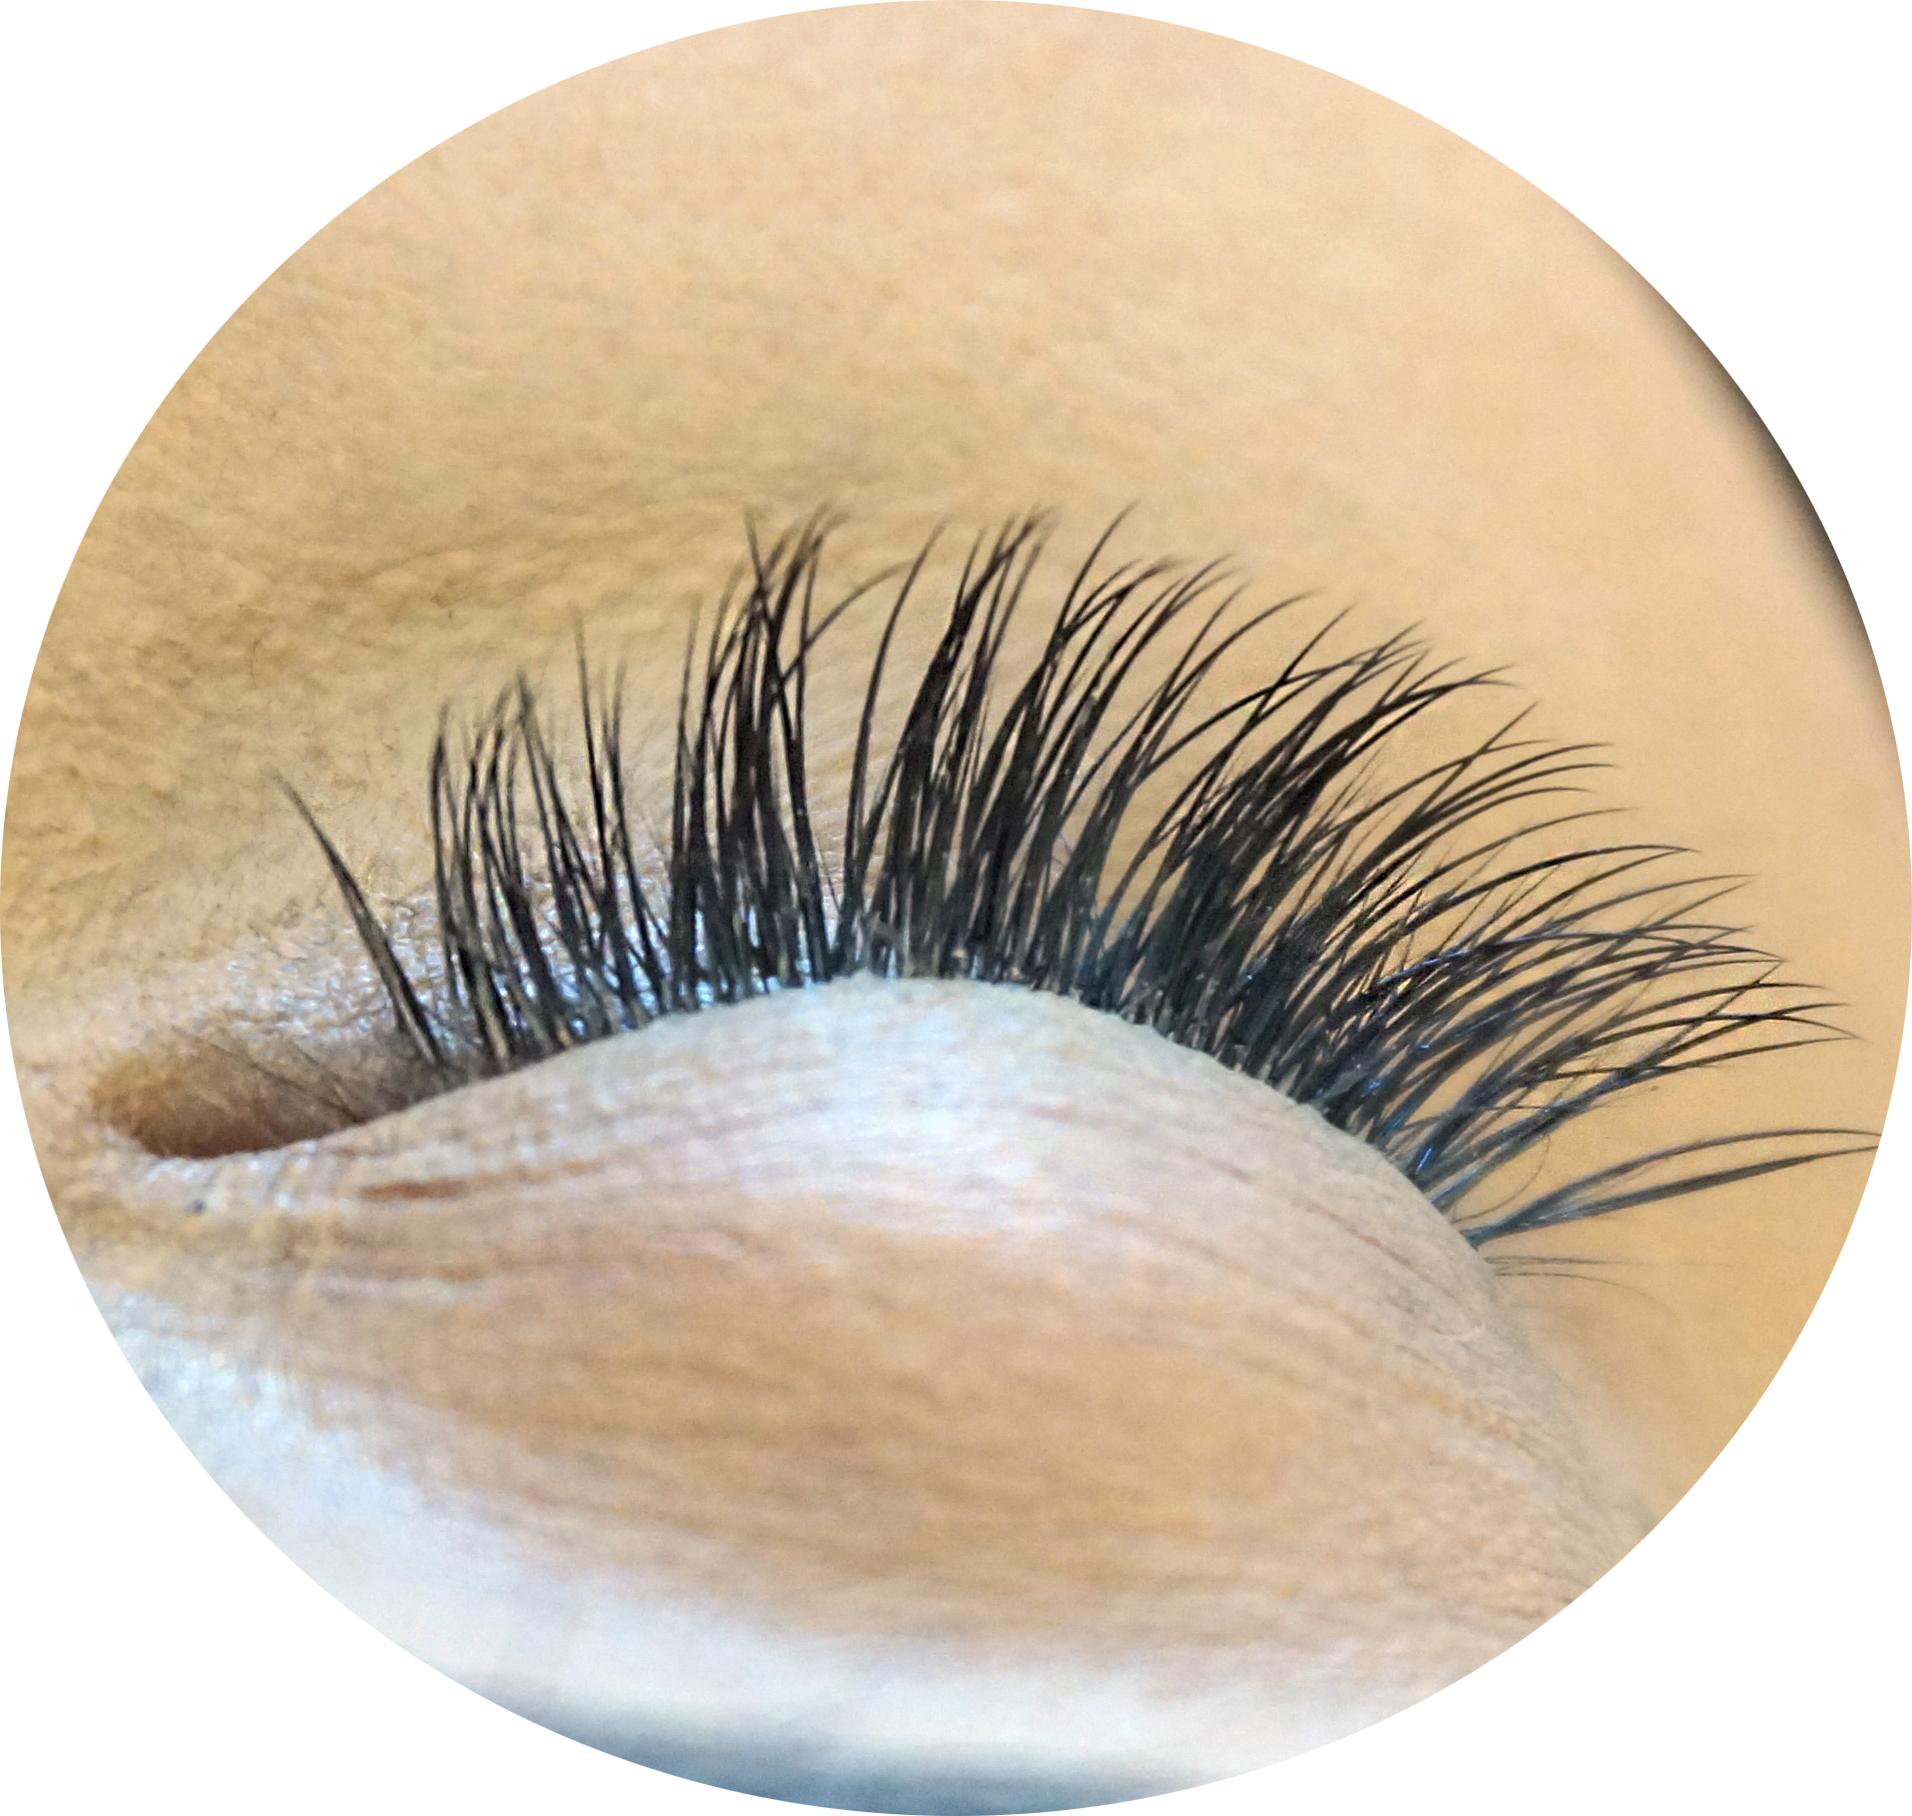 Classic Eyelash Extensions Toronto